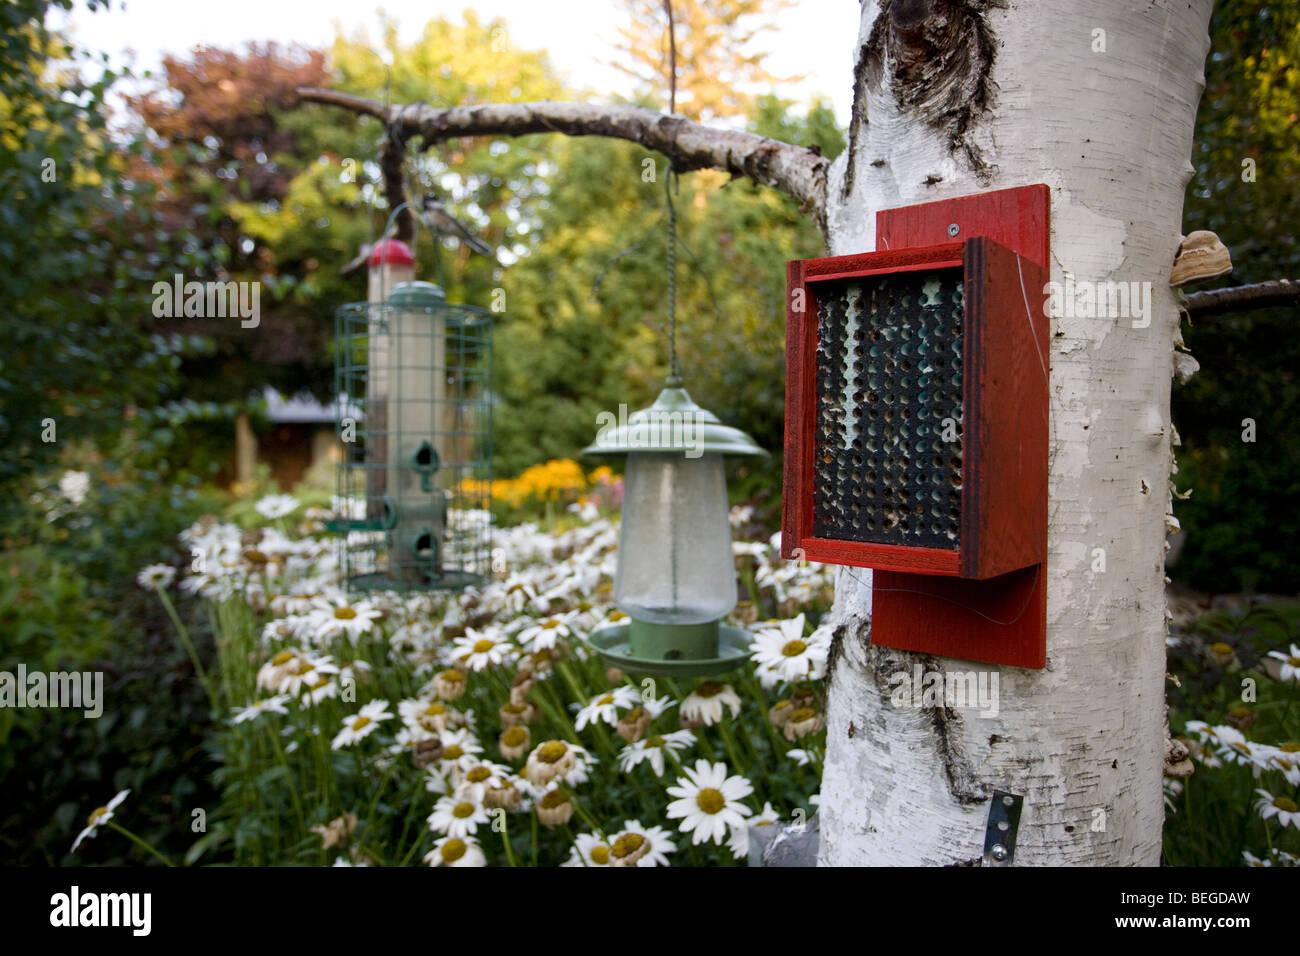 backyard flower garden with bird feeders and homemade beehive